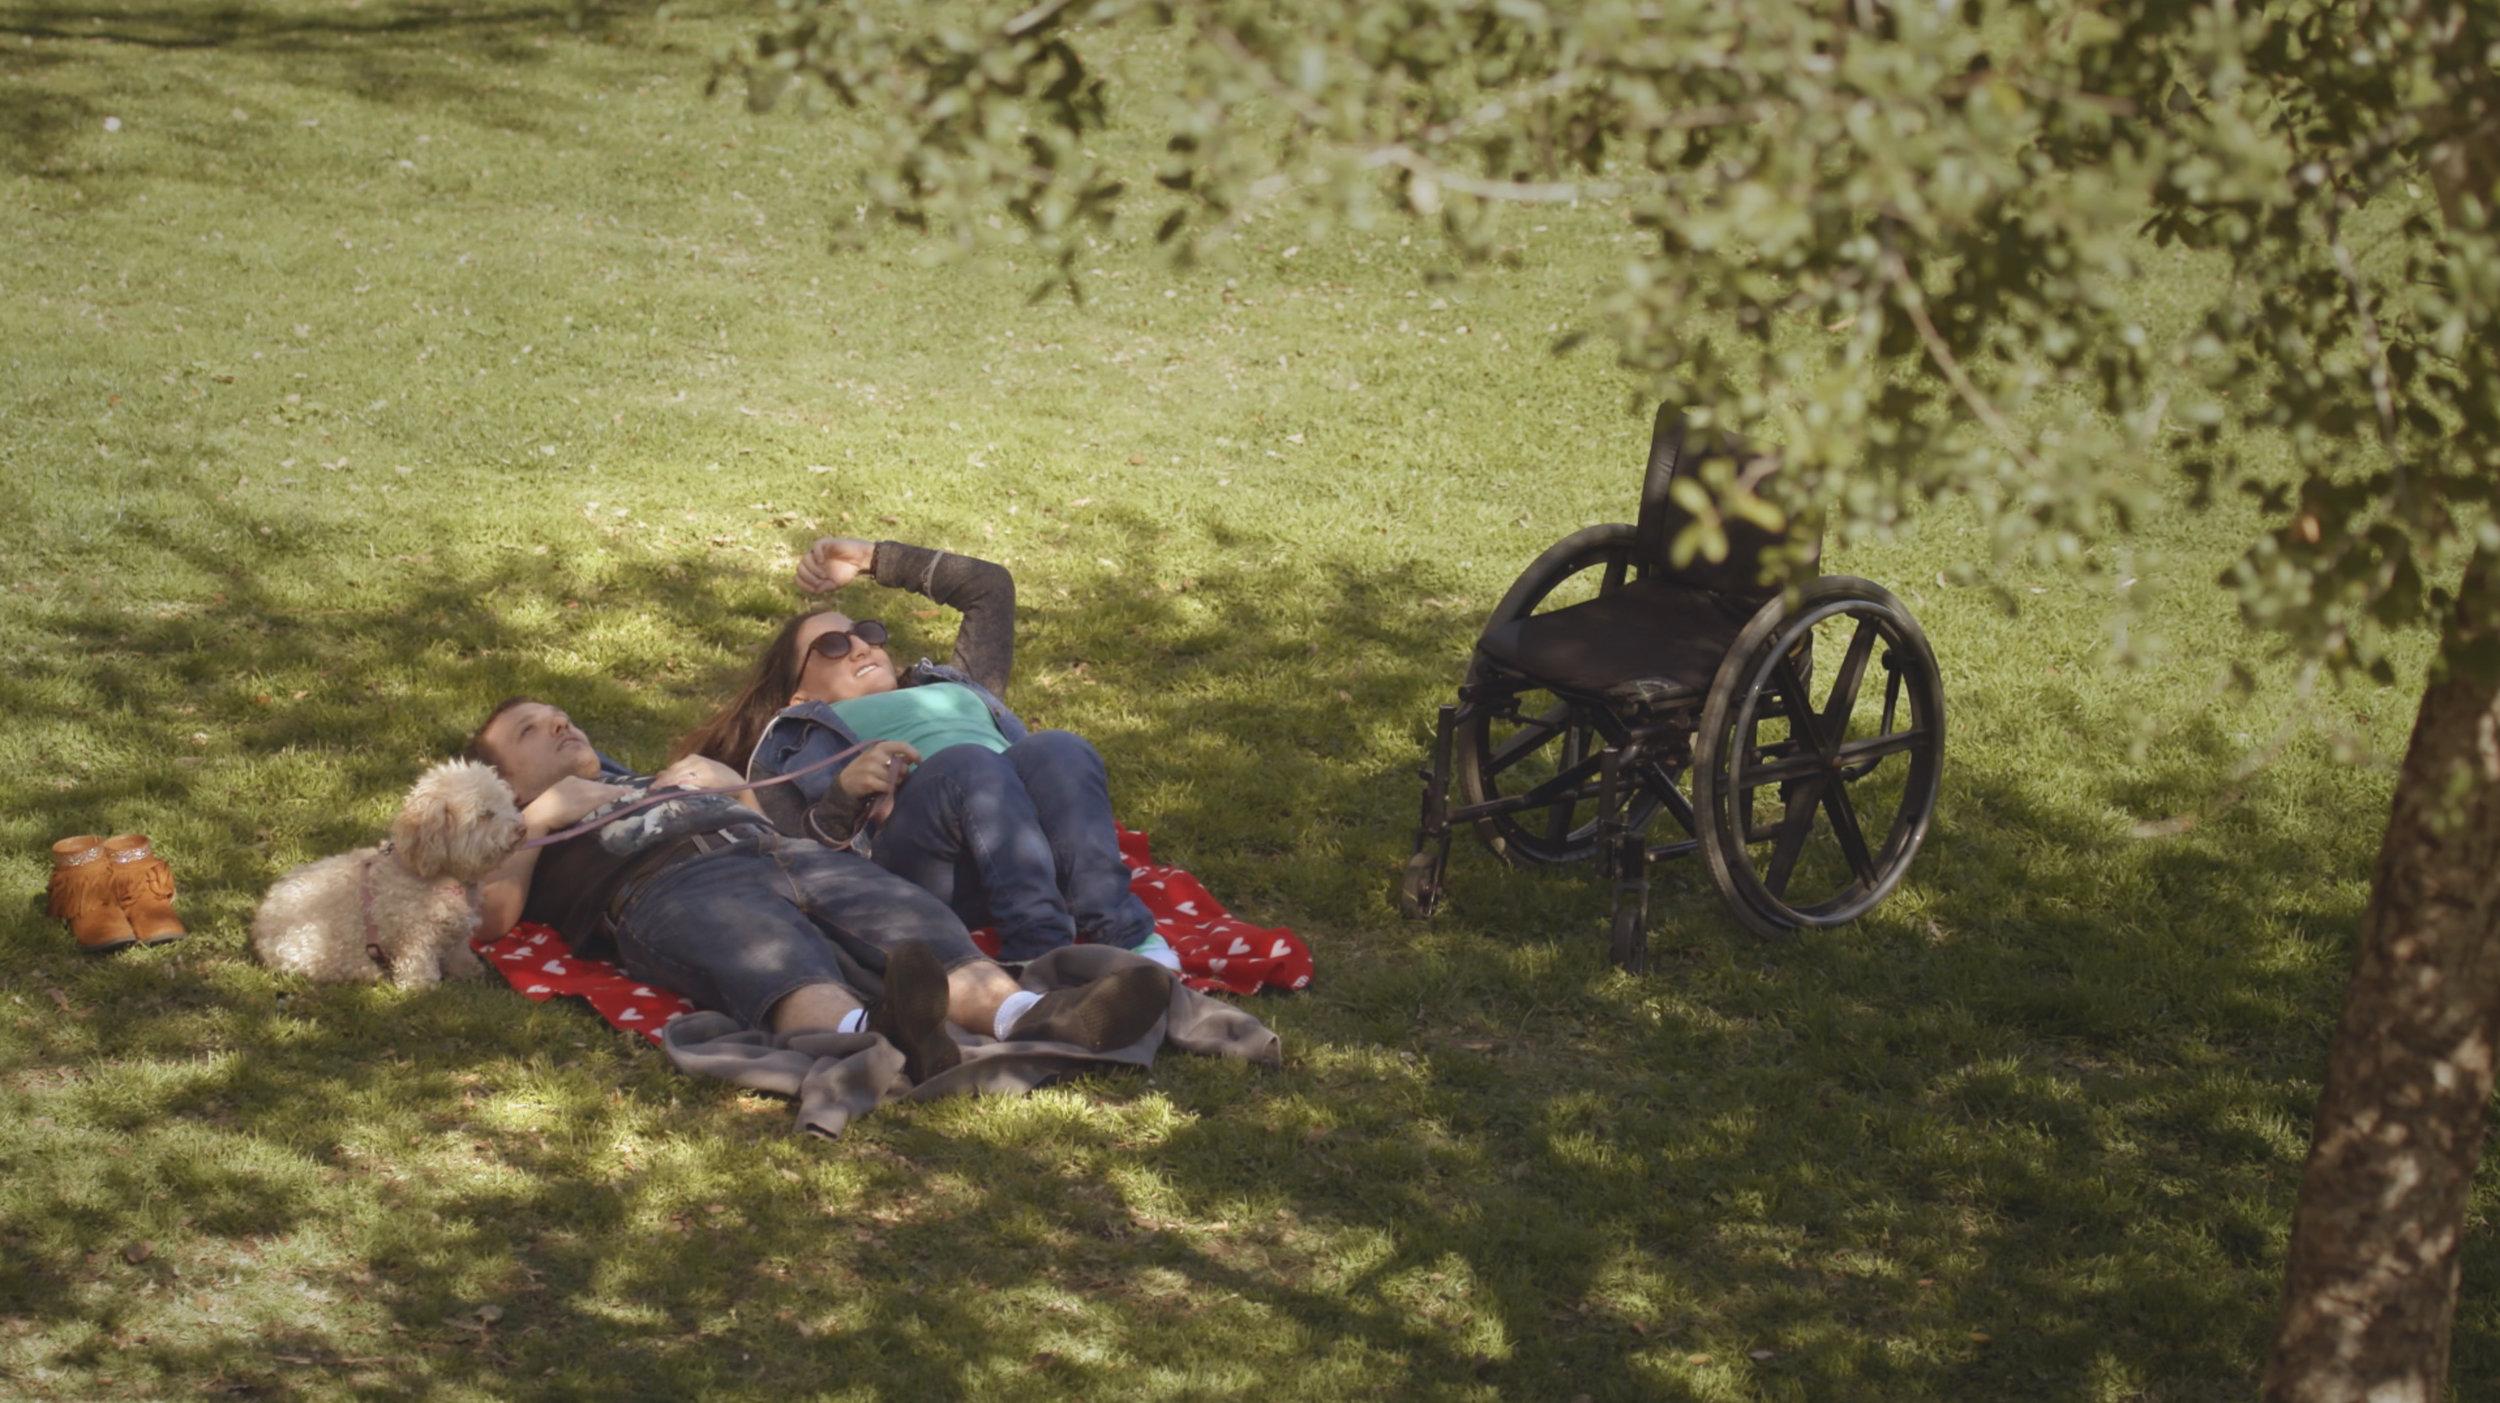 Love&Loss - Student Academy Winning Documentary